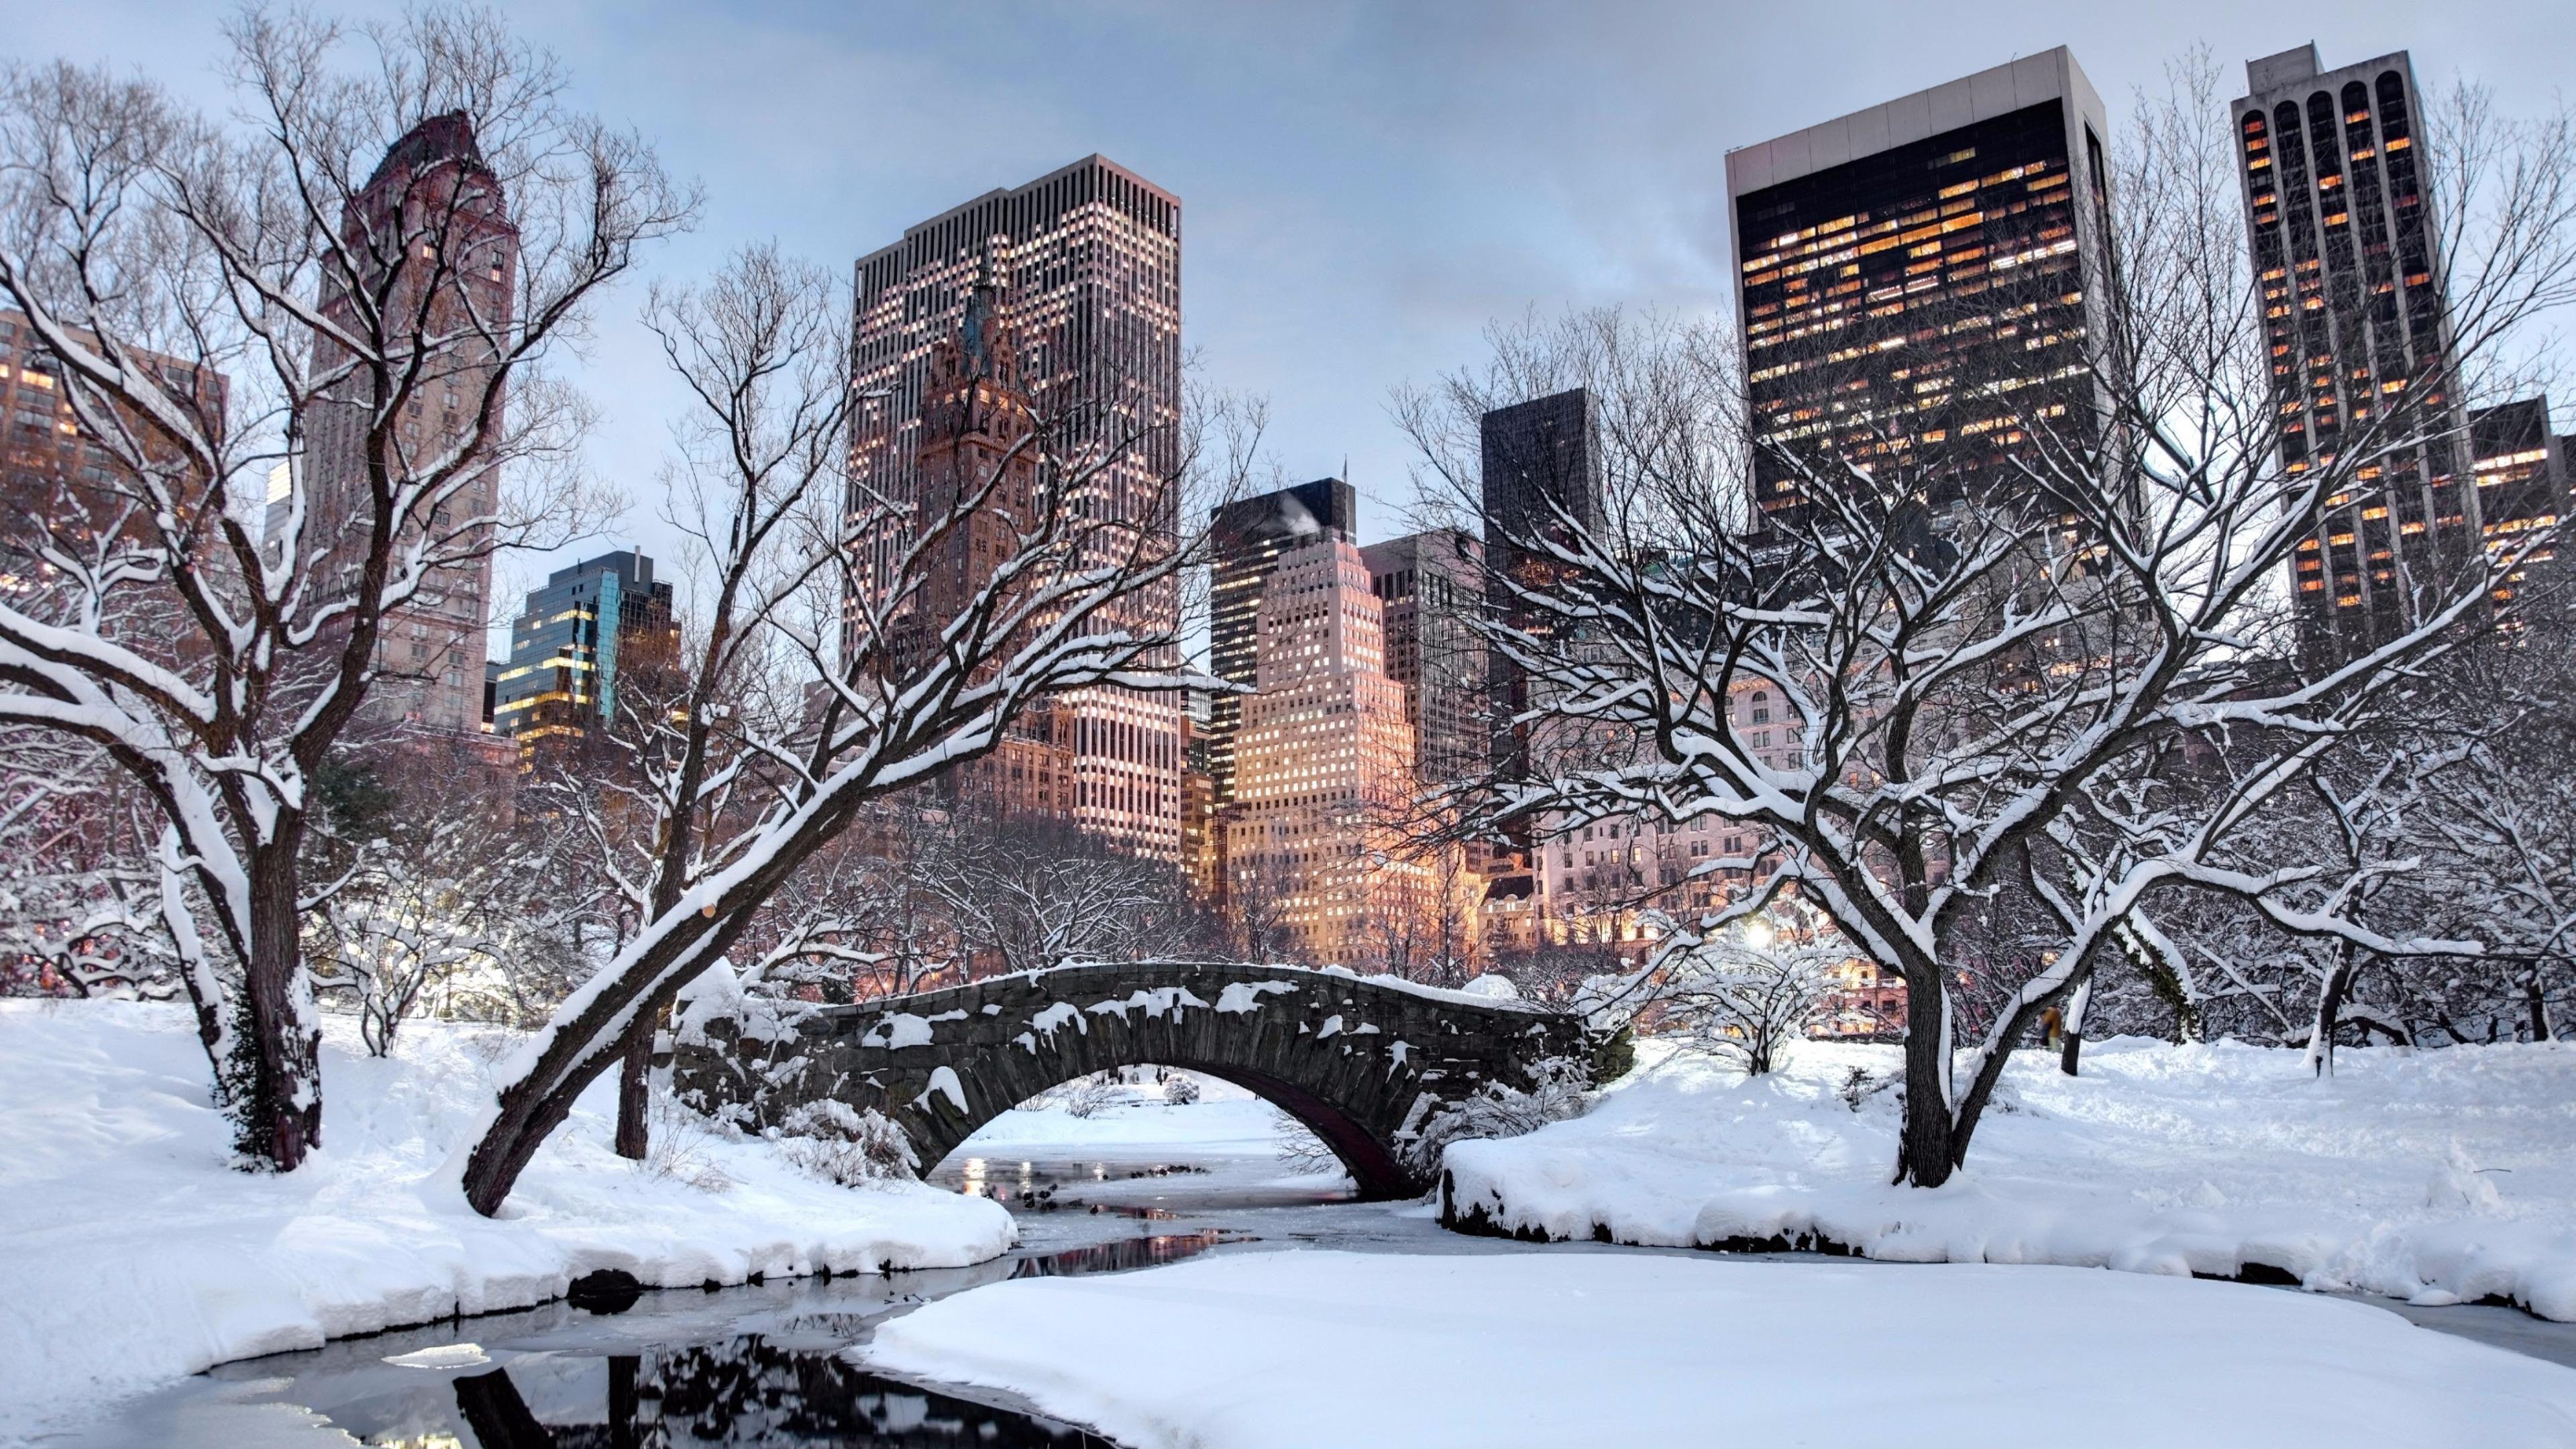 Snow Winter United States New York City Tree Sky Building Wallpaper New York Snow Visiting Nyc Winter Travel